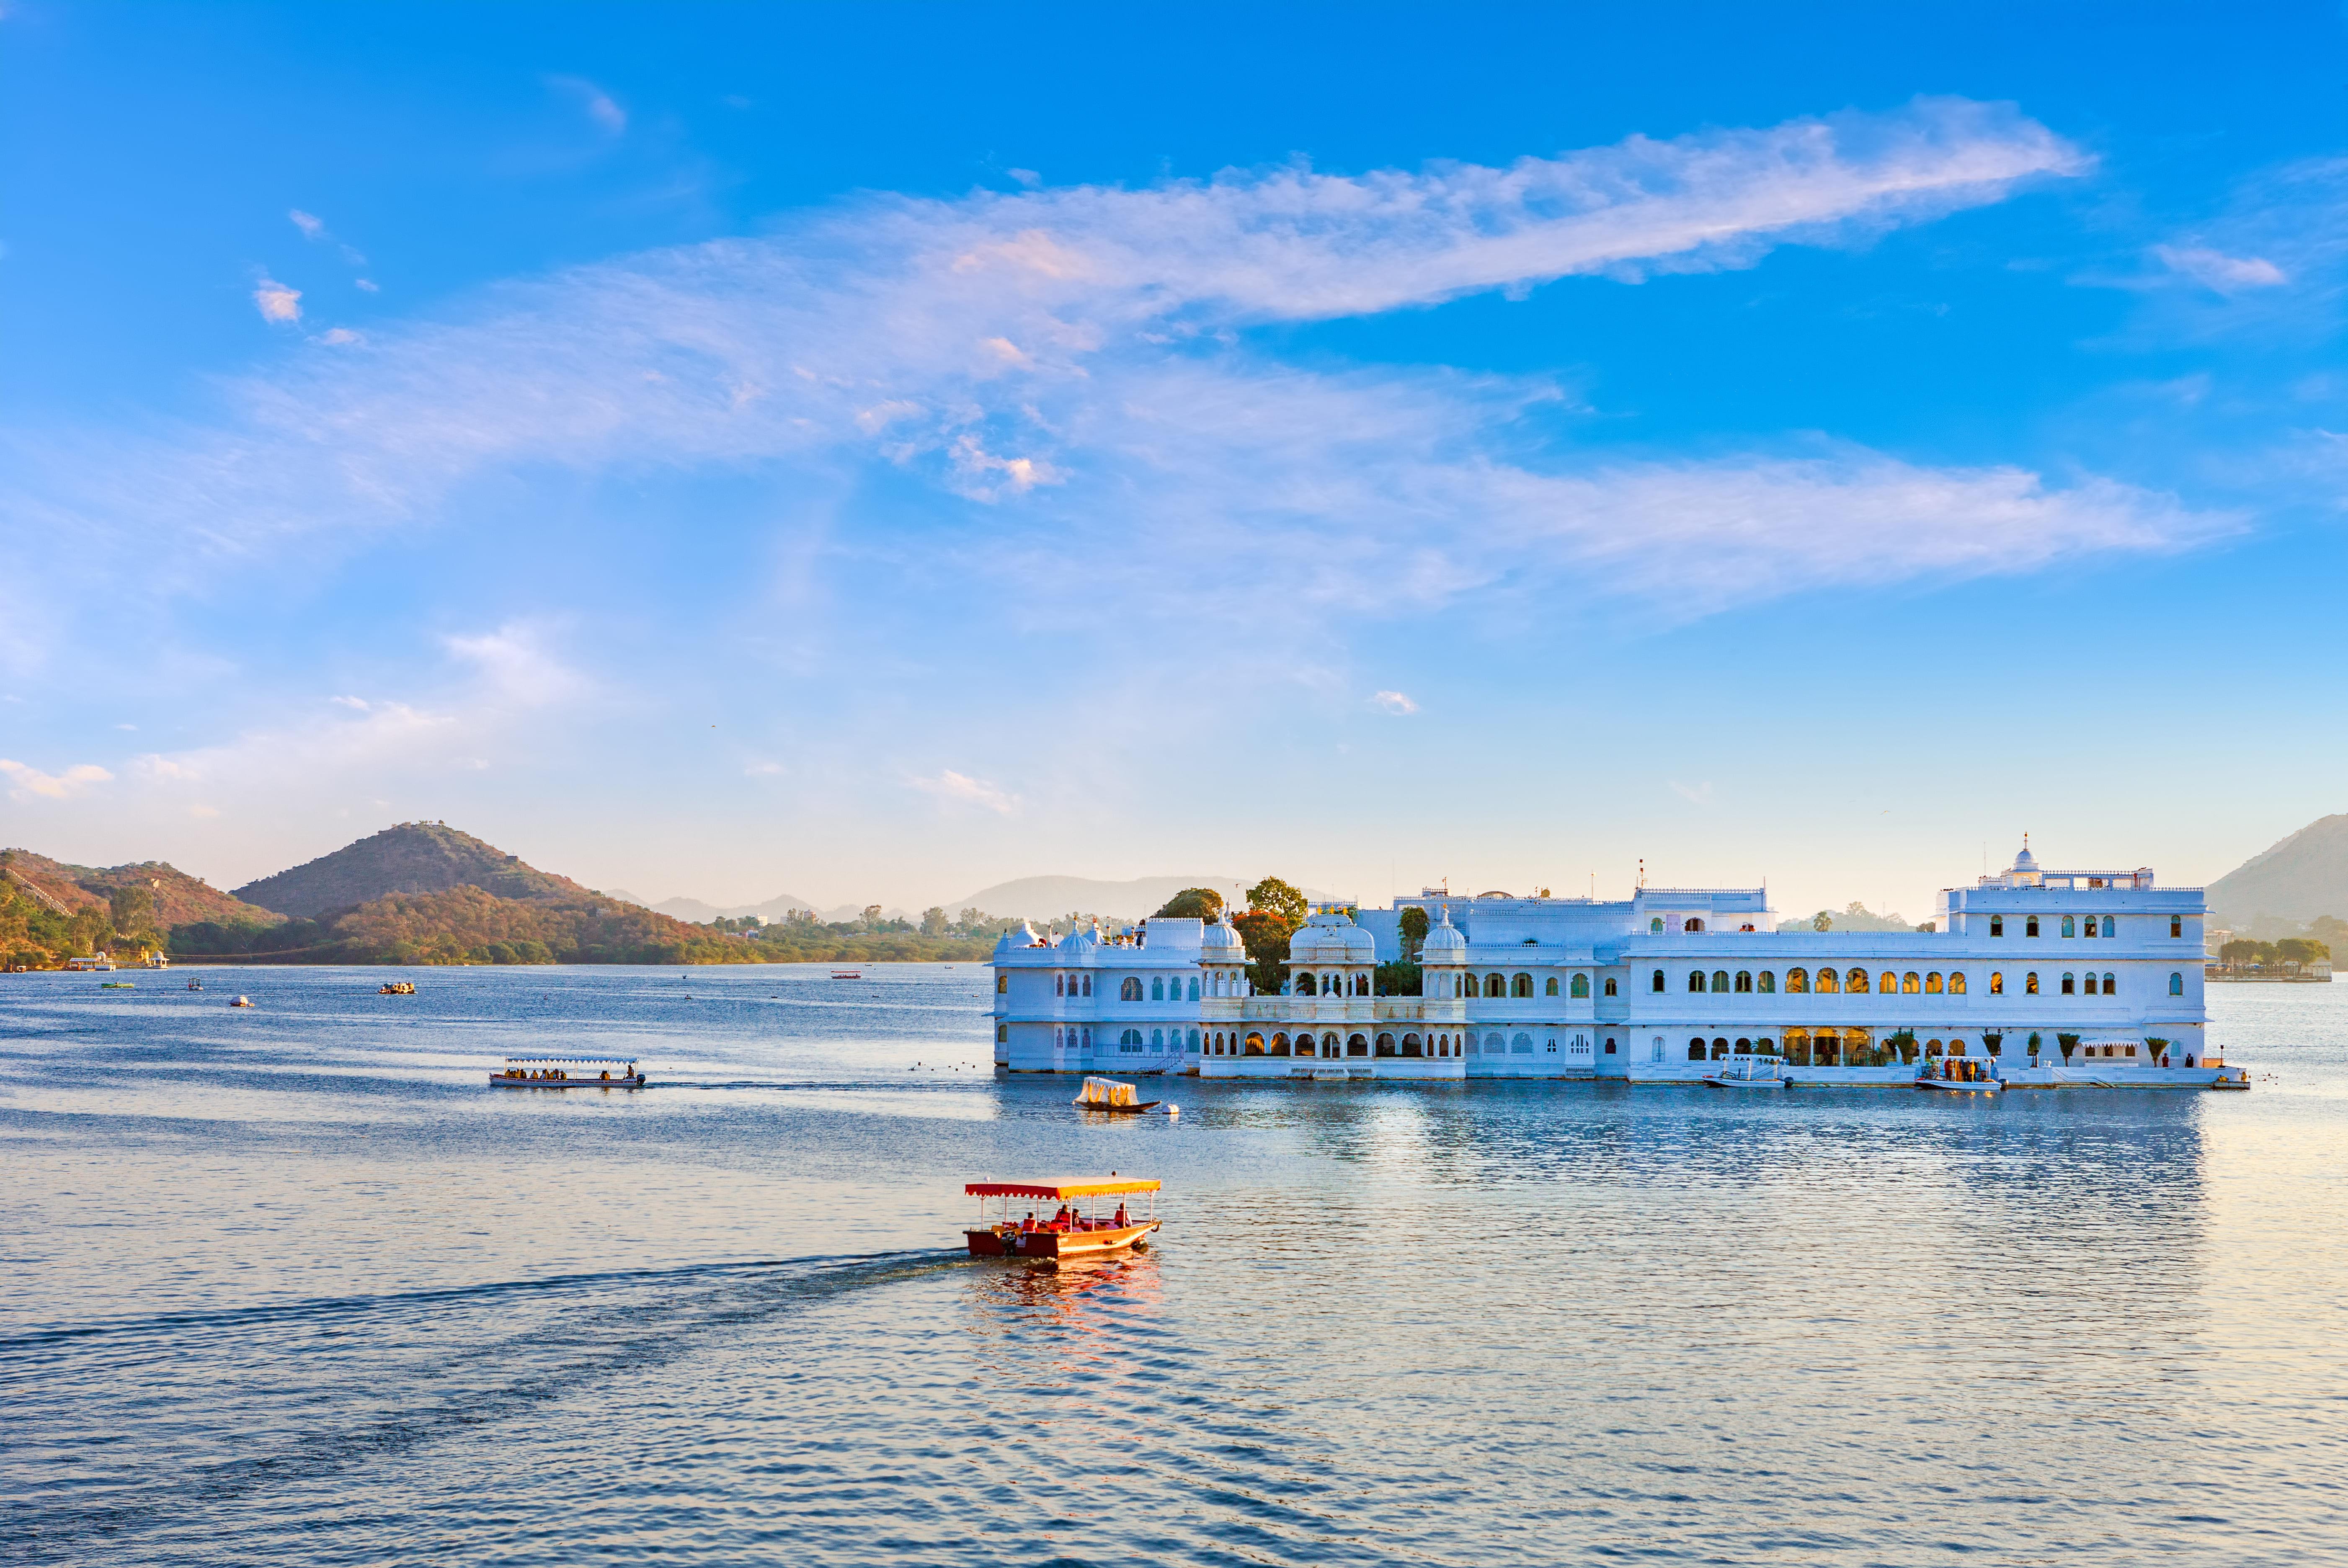 Taj Lake Palace on lake Pichola in Udaipur